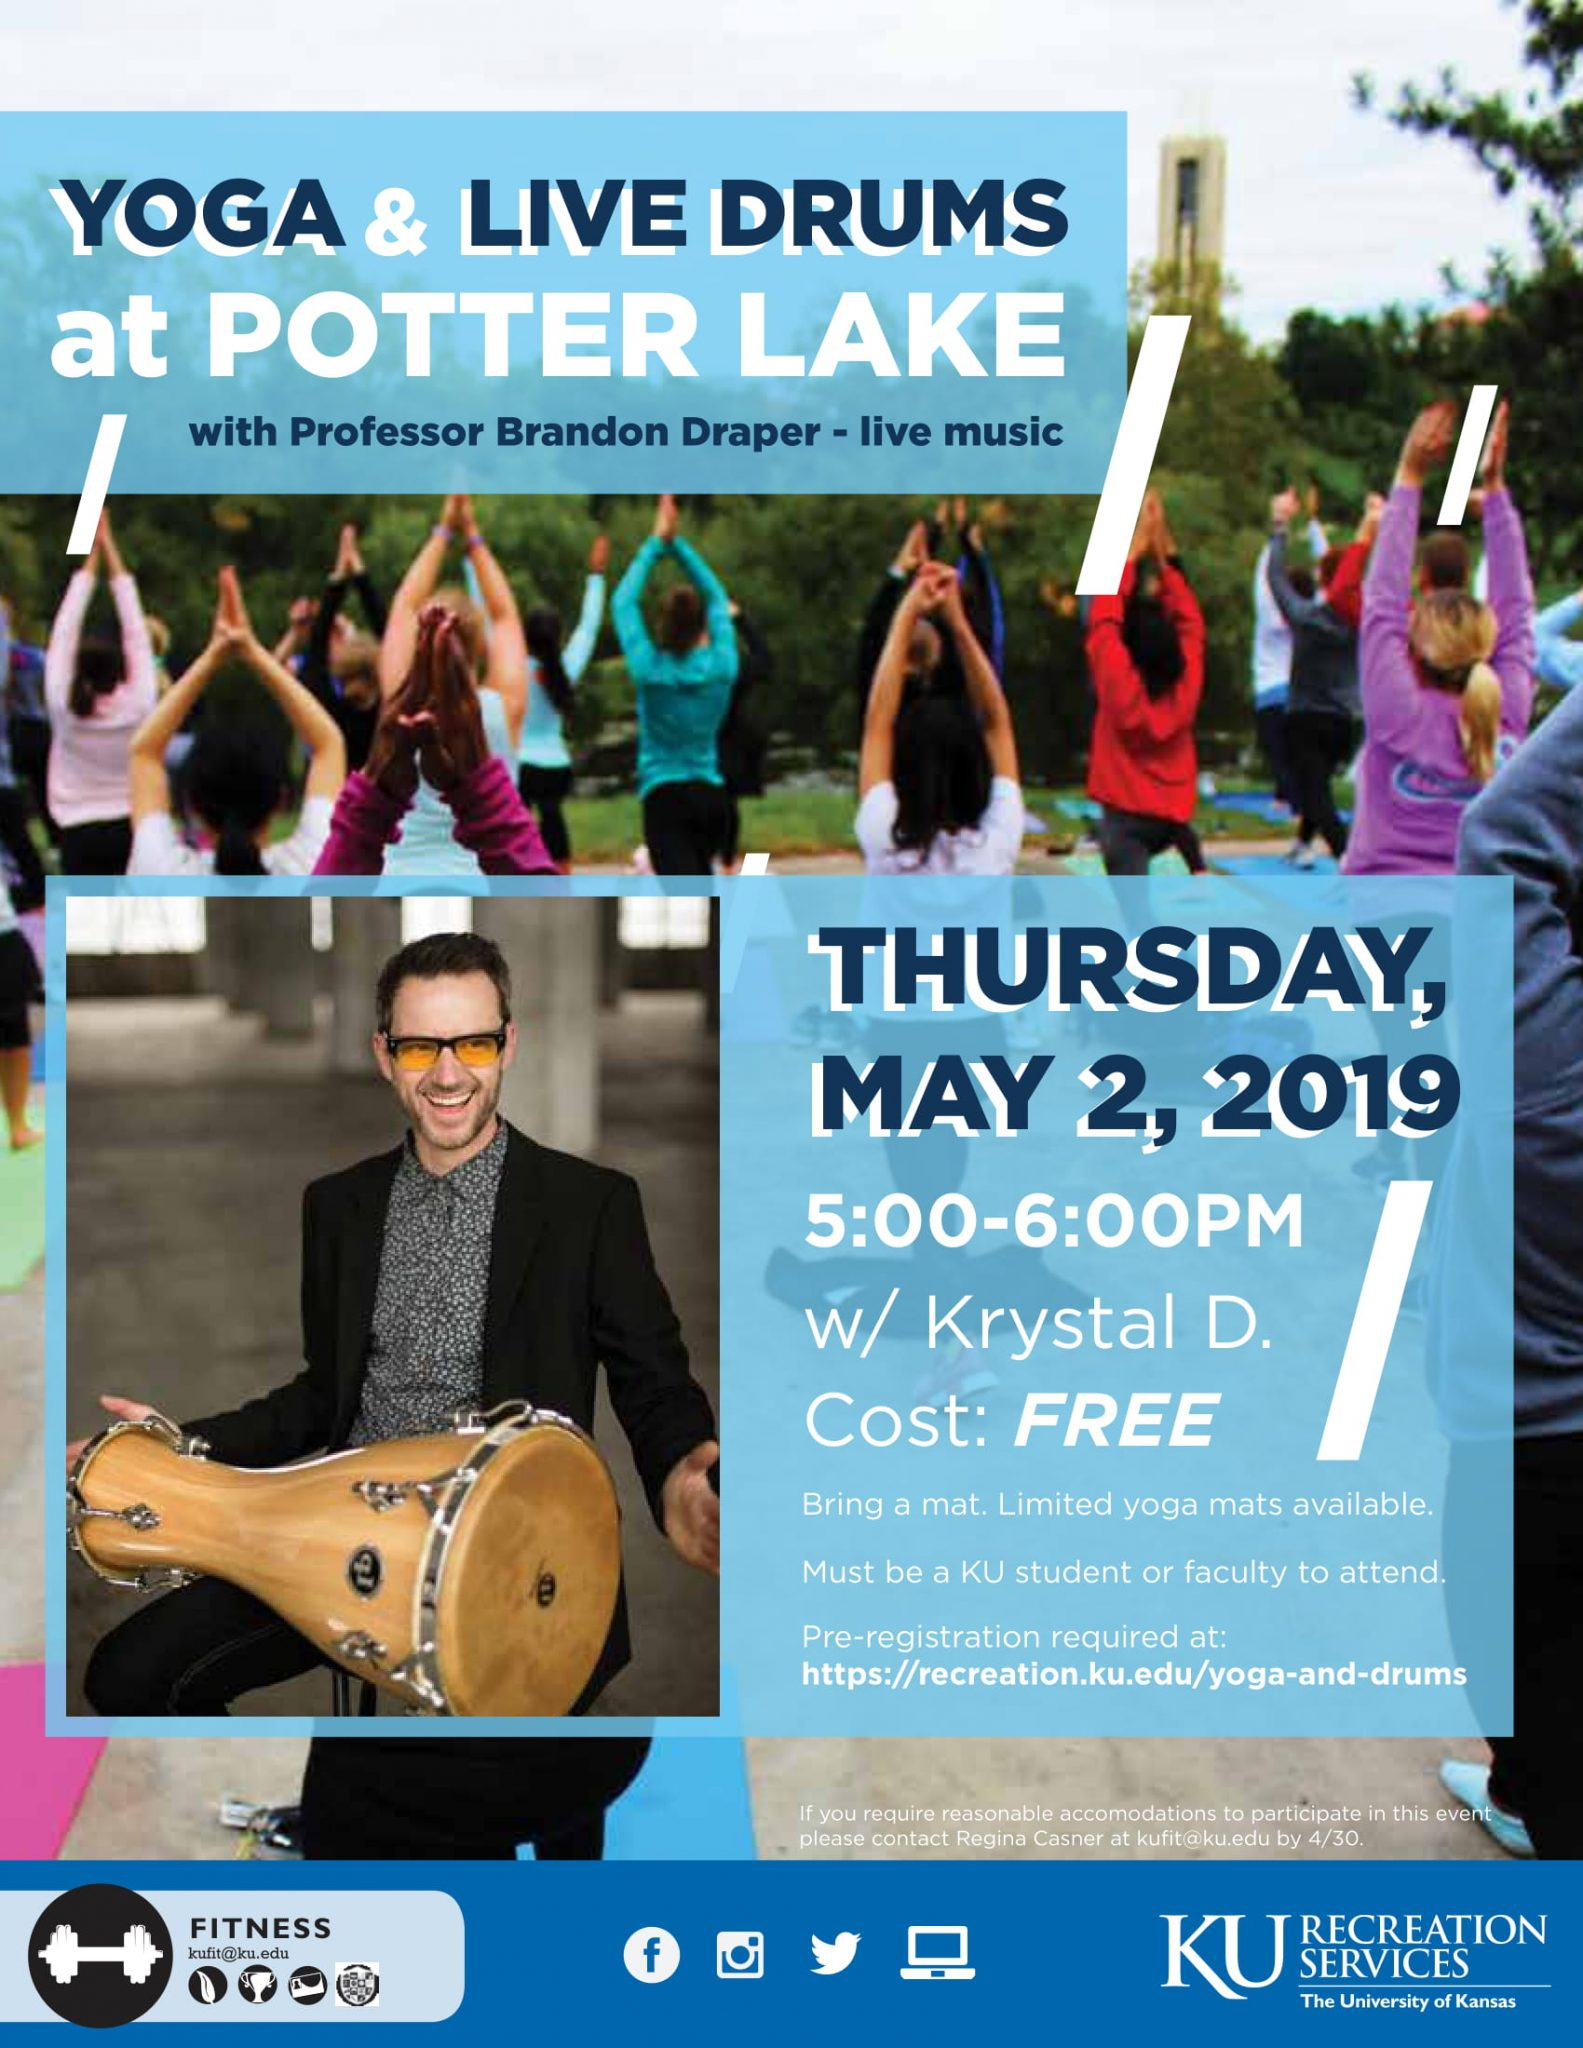 Yoga & Live Drums at Potter Lake